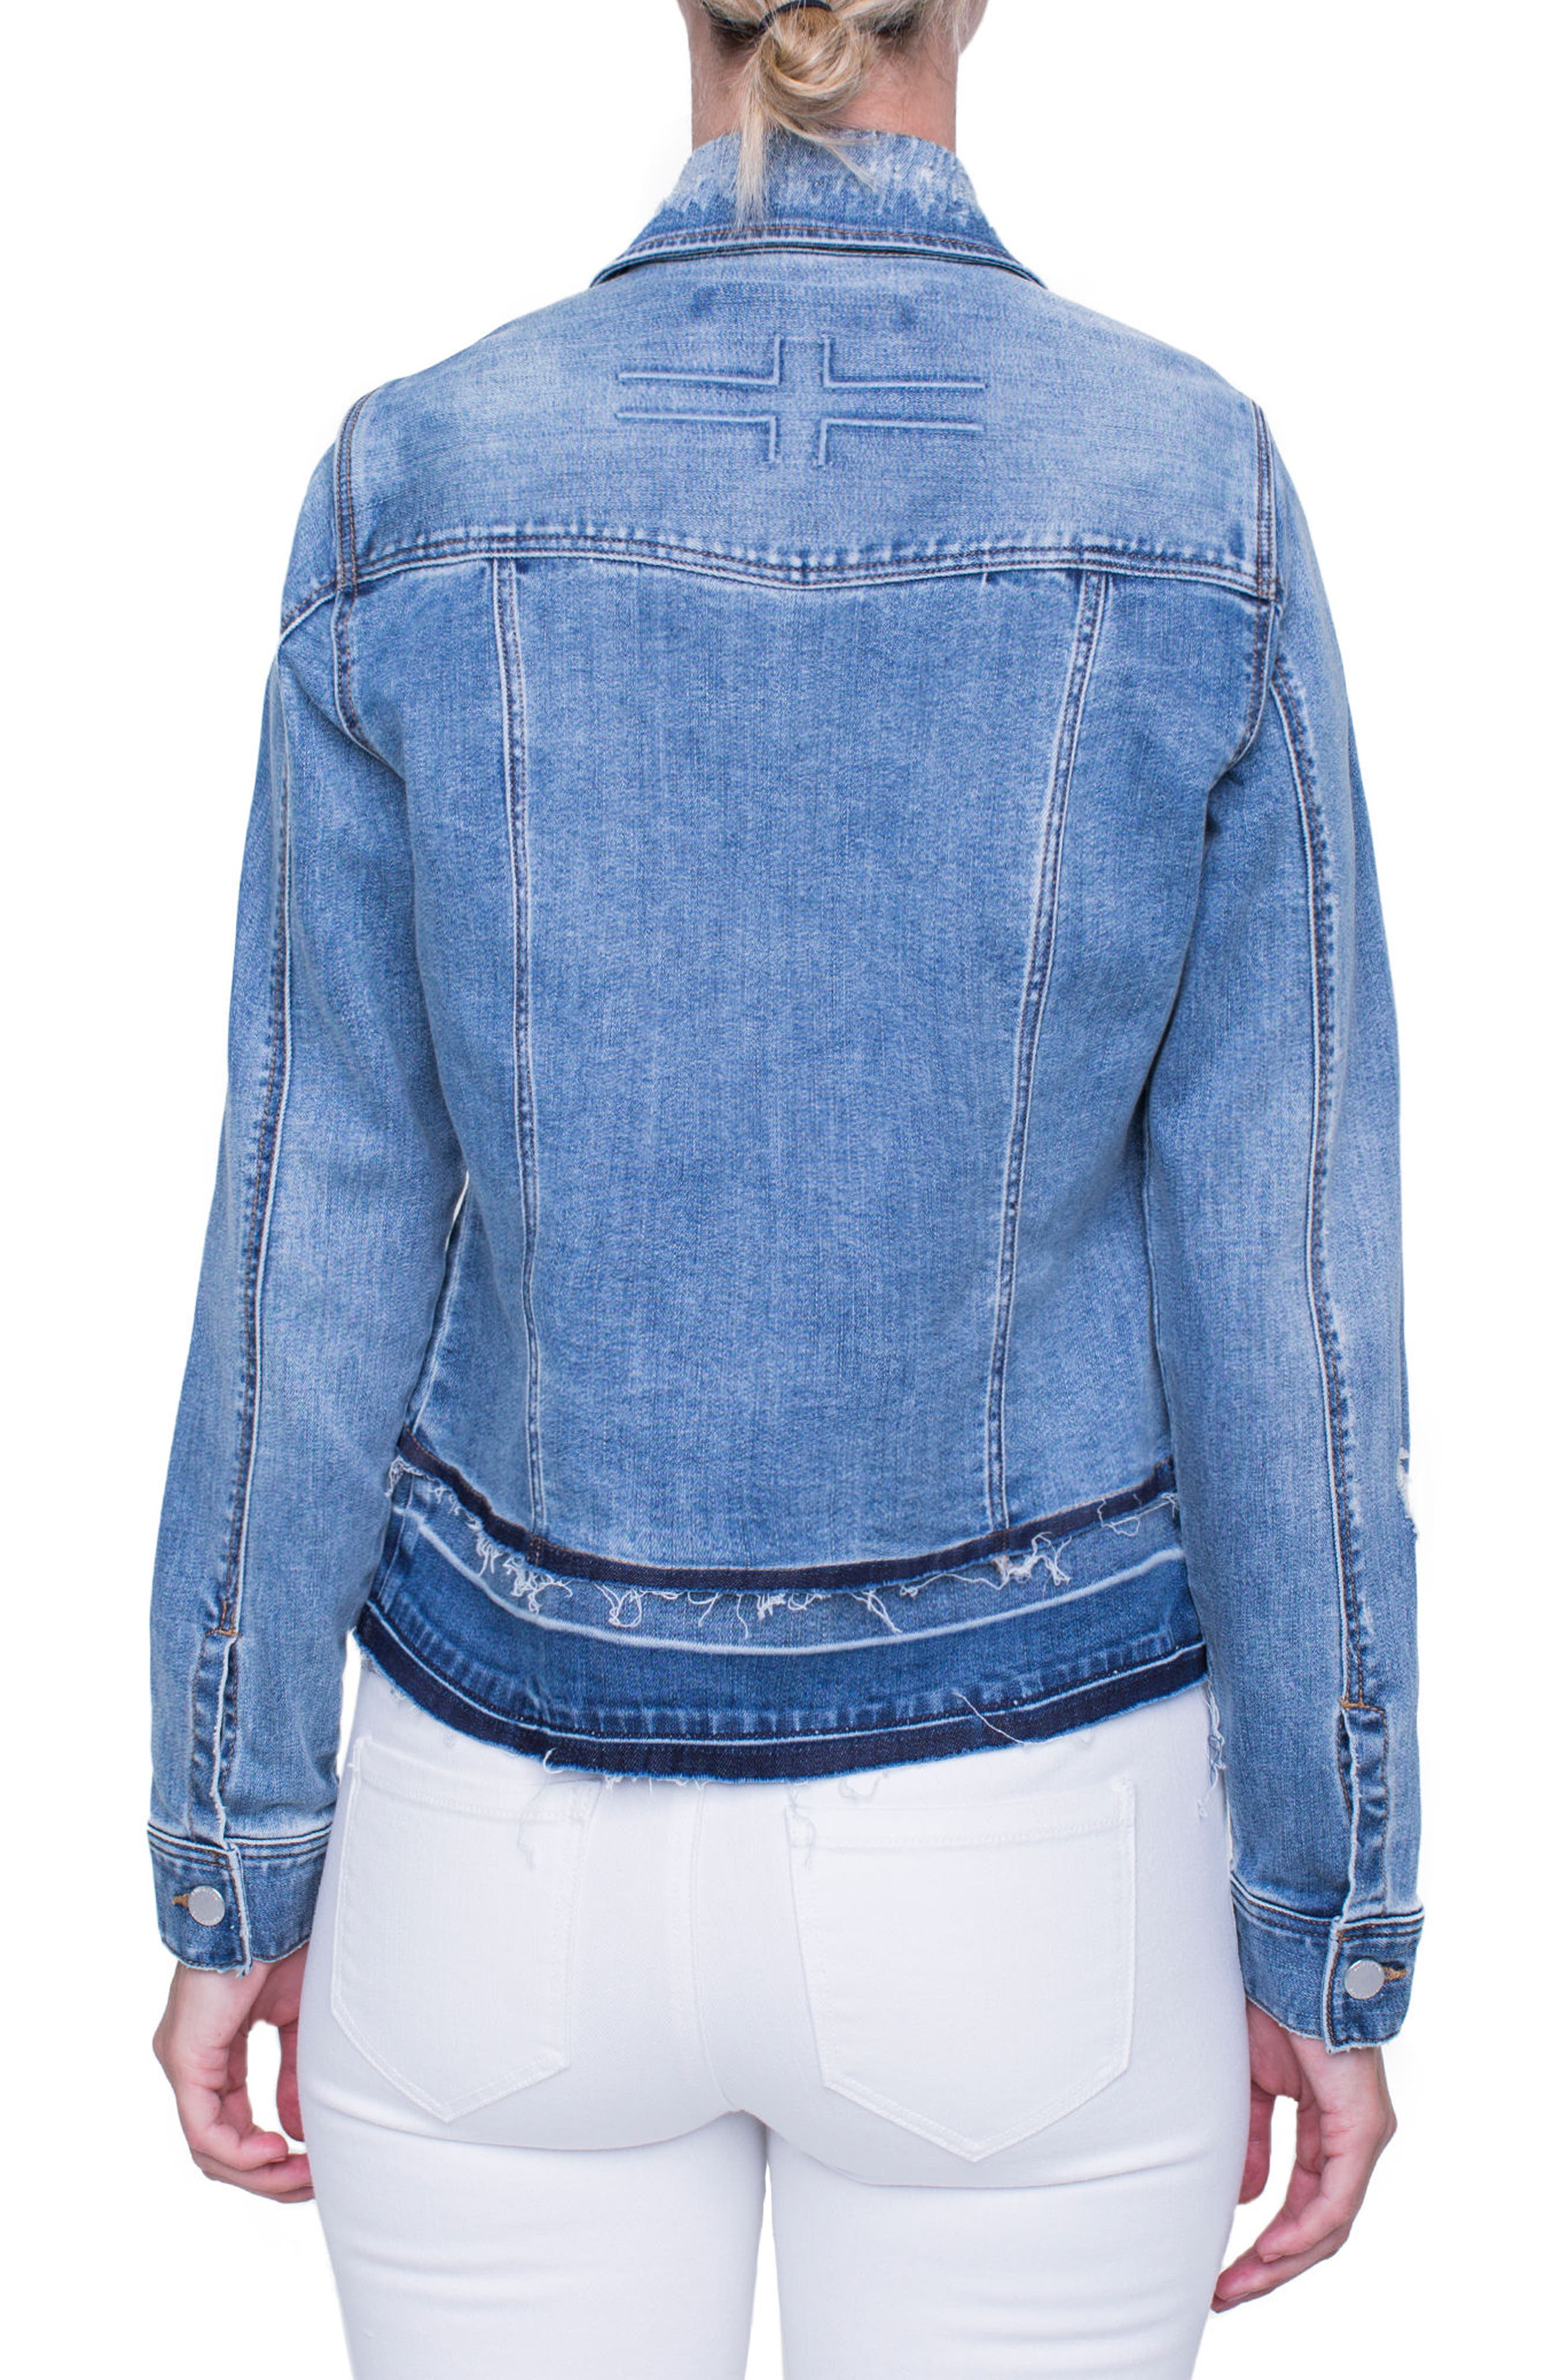 Tiered Hem Denim Jacket,                             Alternate thumbnail 2, color,                             Blue